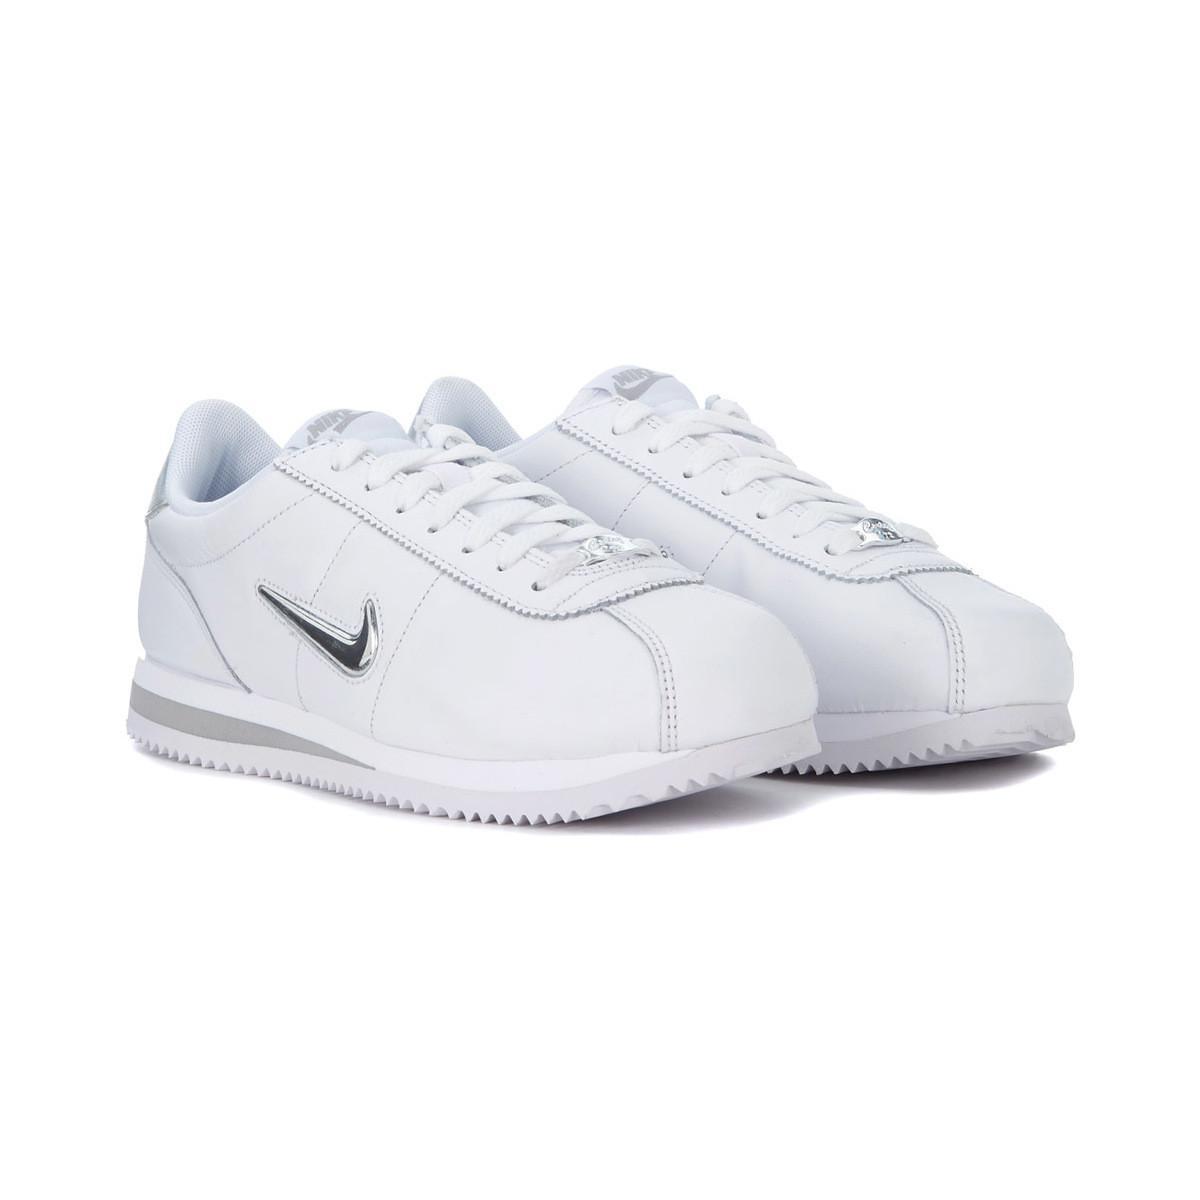 Nike Sneaker Cortez Basic Jewel In Pelle Bianca E Argento Men's Trainers In White for Men